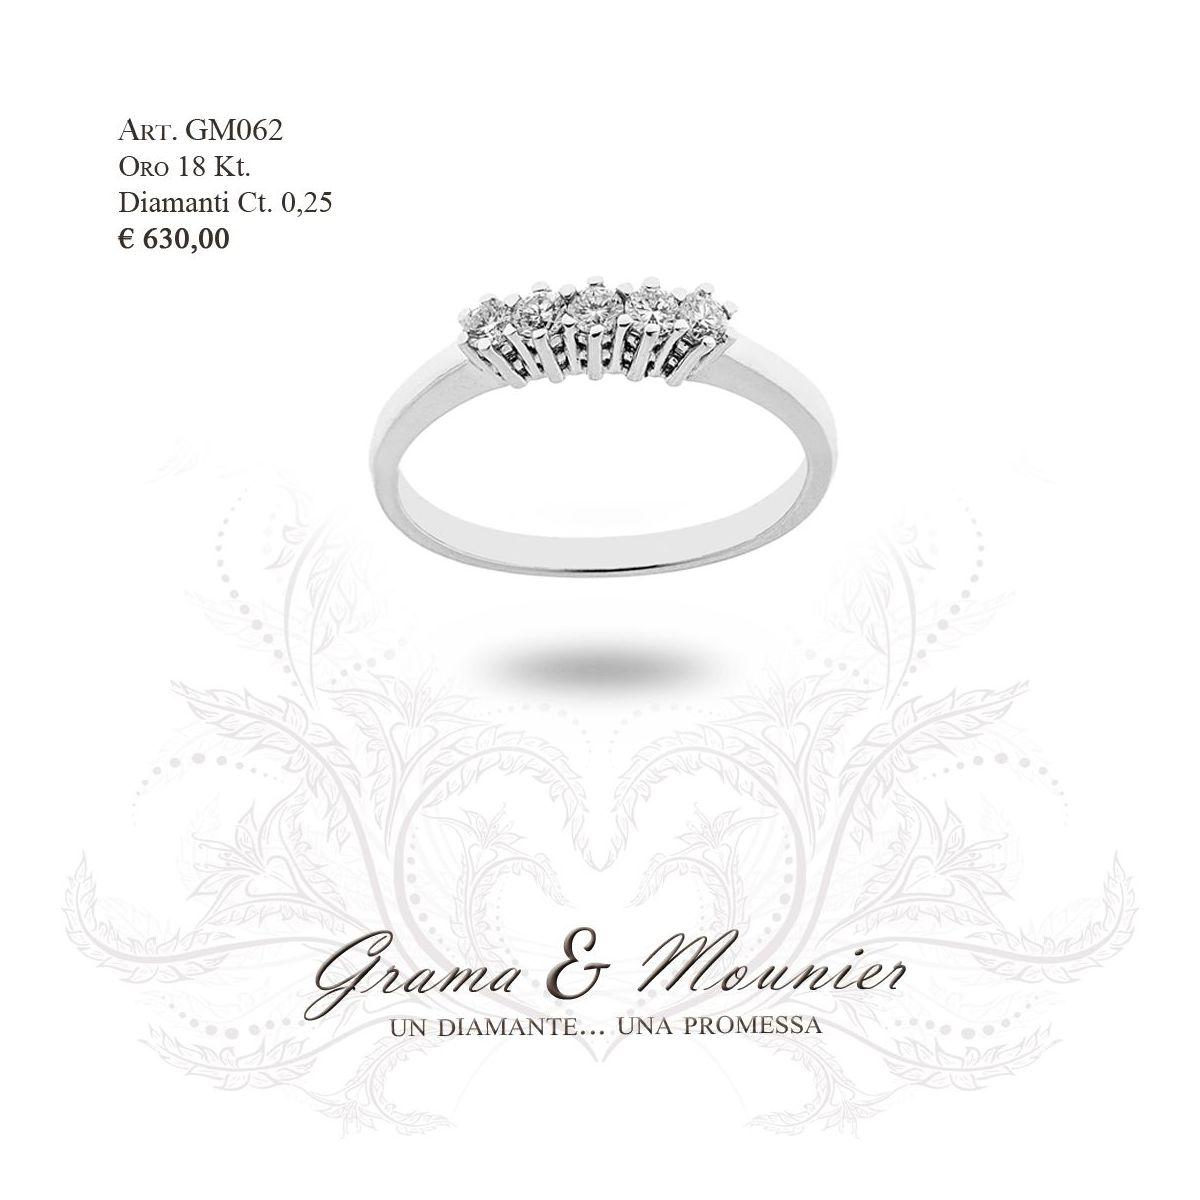 Anello in oro 18Kt. Grama&Mounier Art.GM062